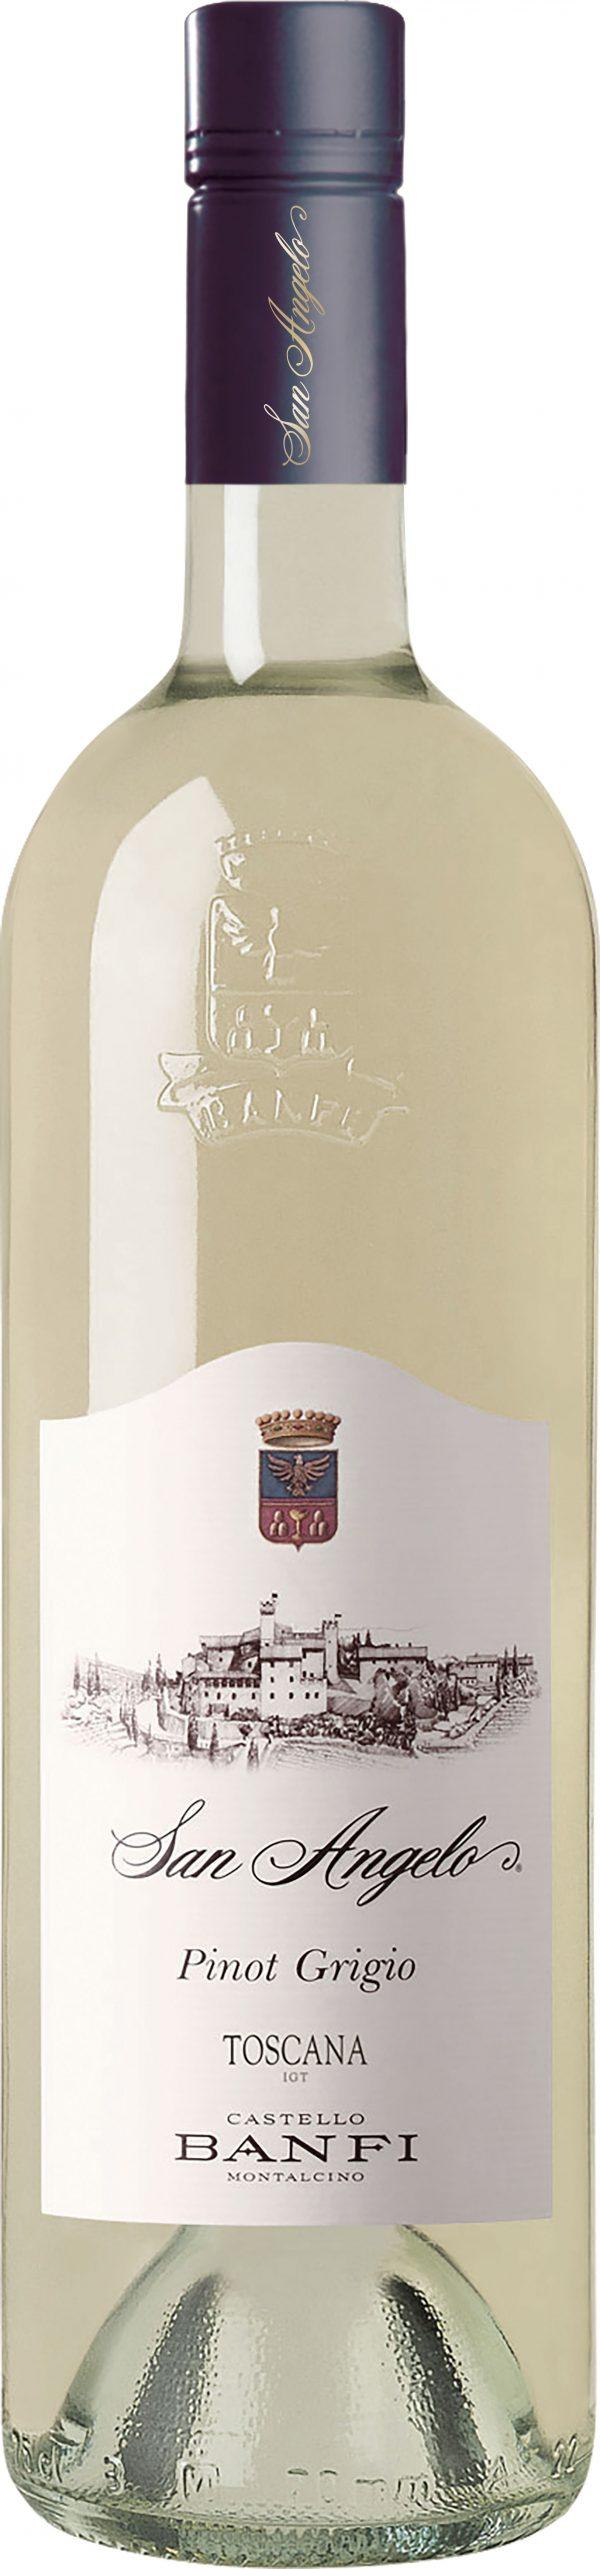 Castello Banfi - San Angelo Pinot Grigio 2017 75cl Bottle